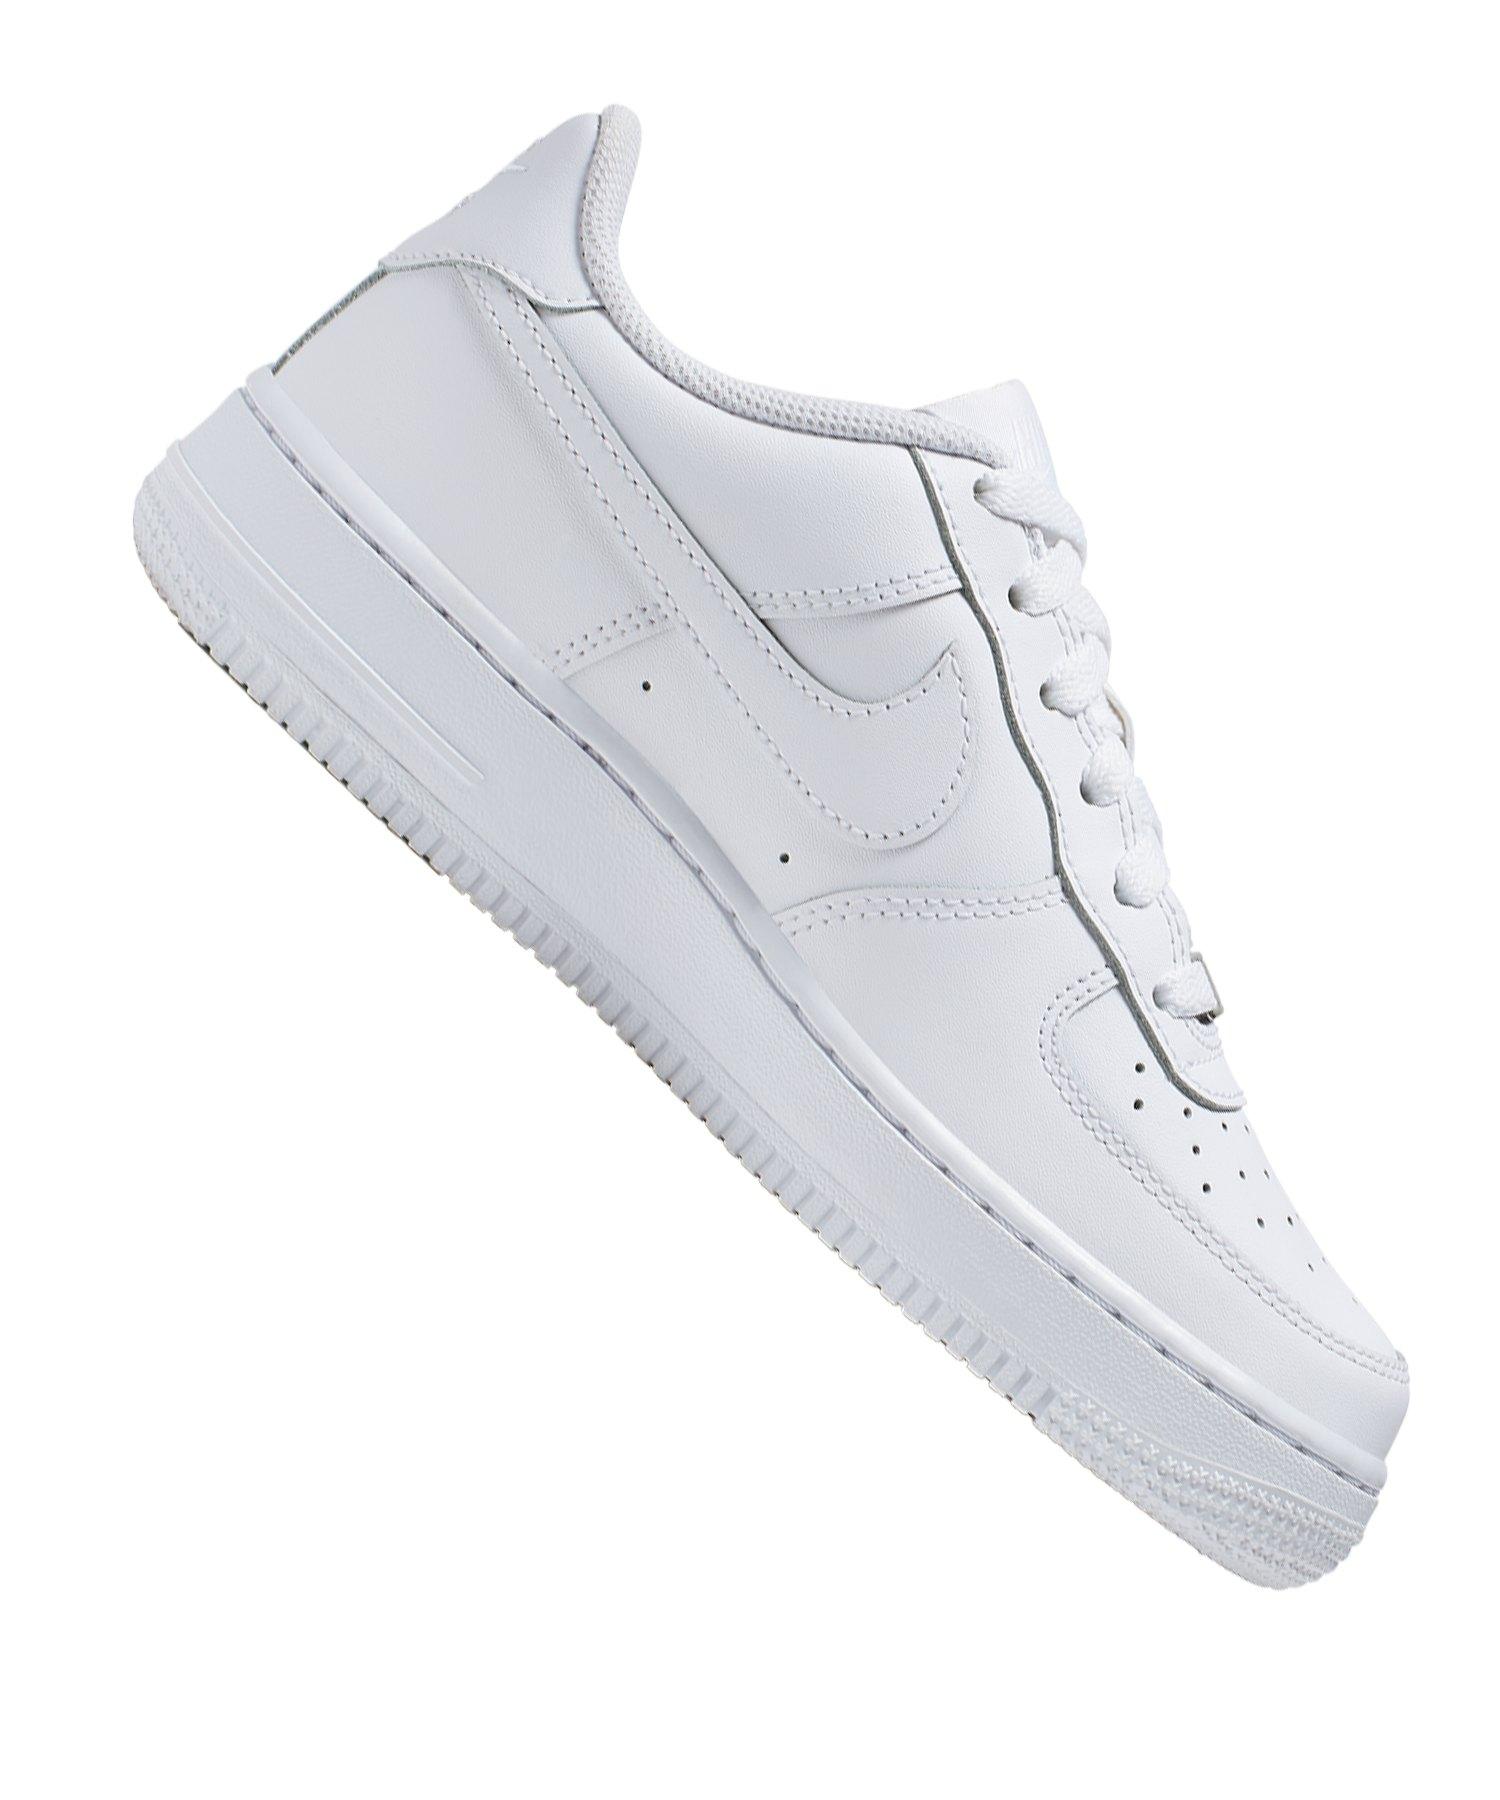 Nike Air Force 1 Sneaker Kids Weiss F117 | Freizeit | Lifestyle ...